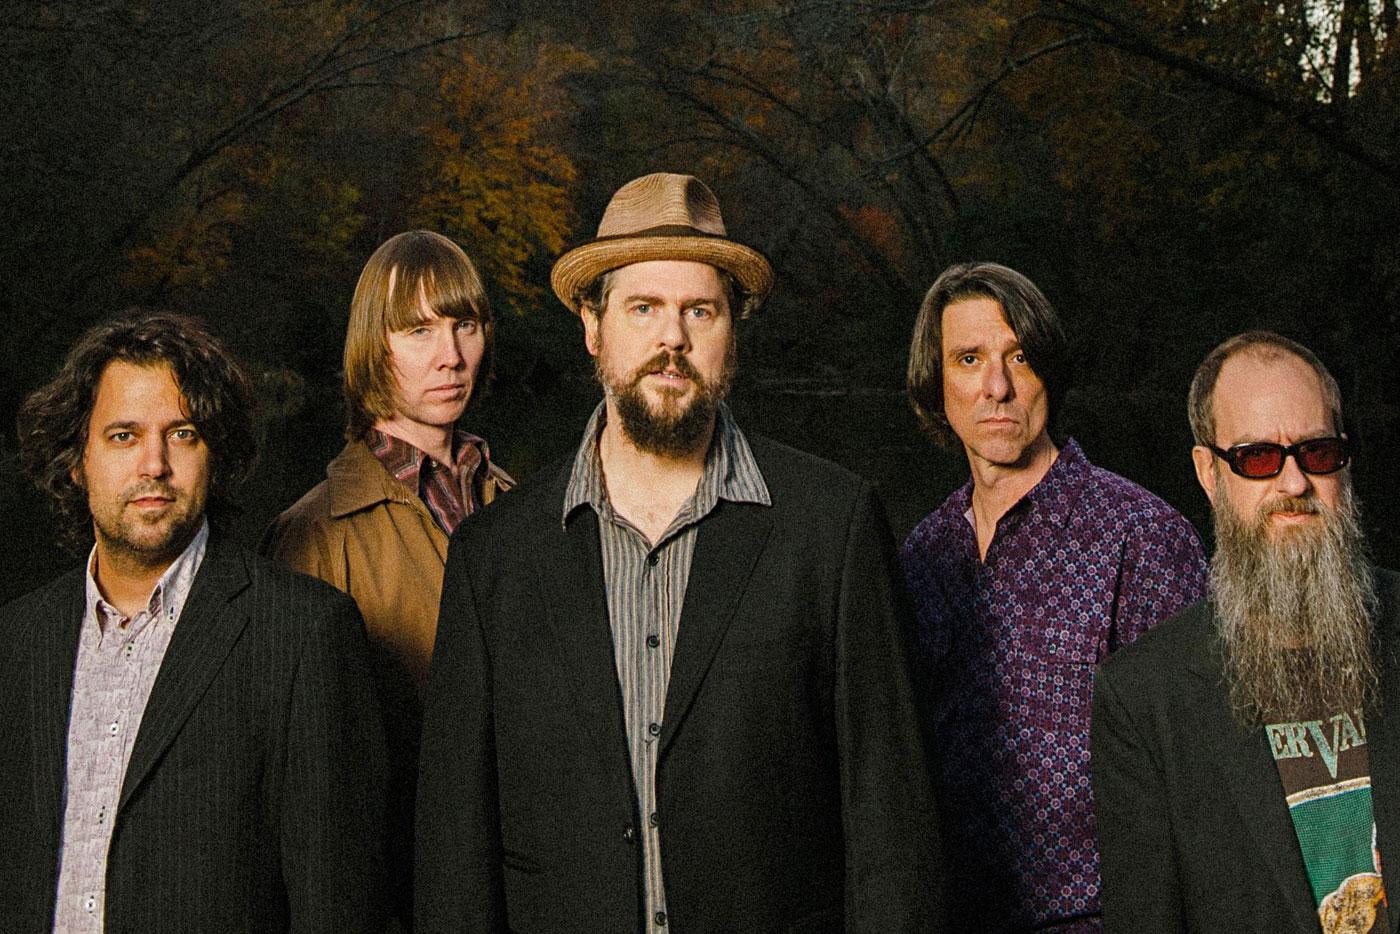 Drive By Truckers gira y nuevo disco